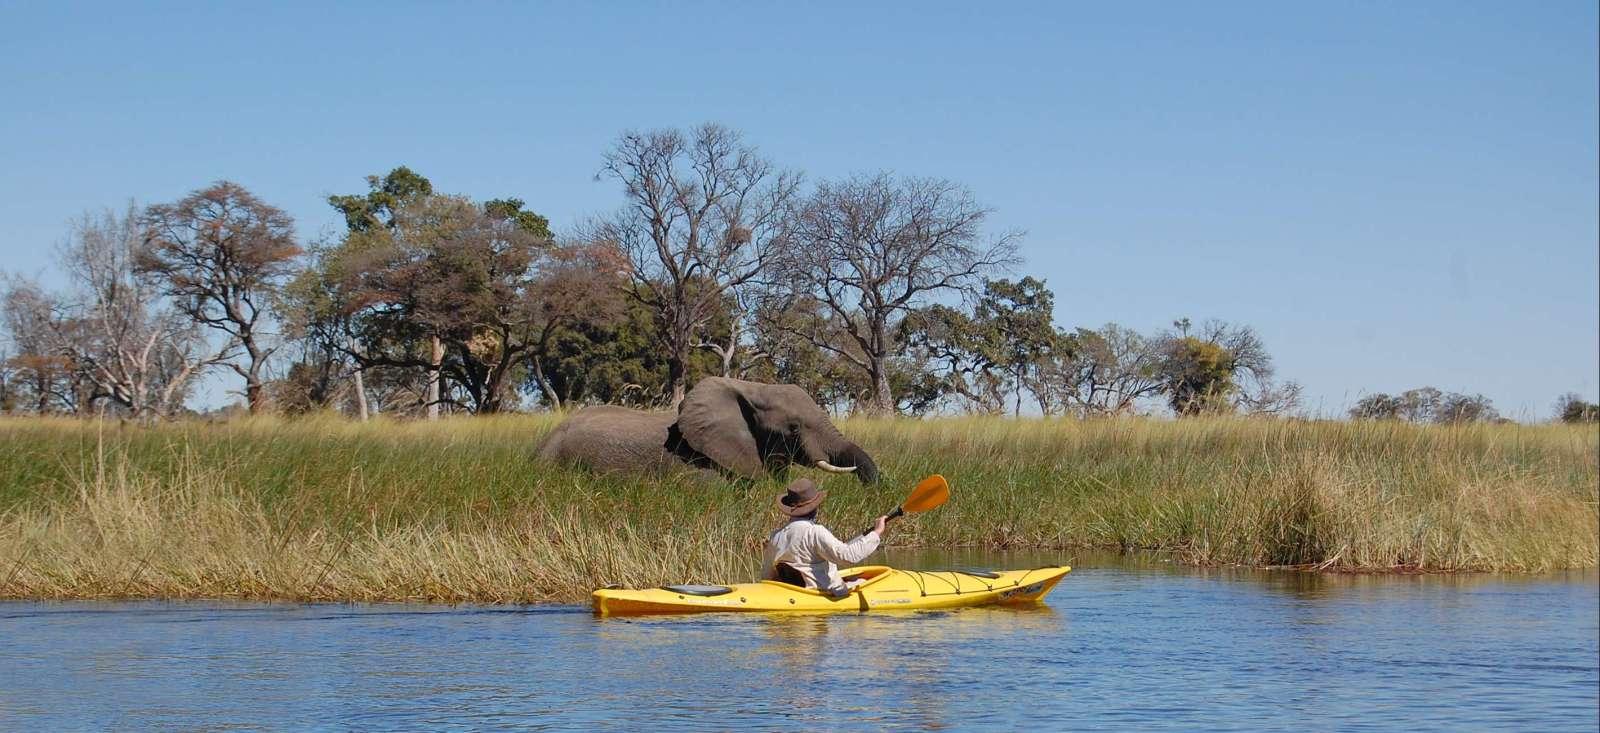 Voyage sur l'eau Botswana : Grande traversée de l\'Okavango en kayak